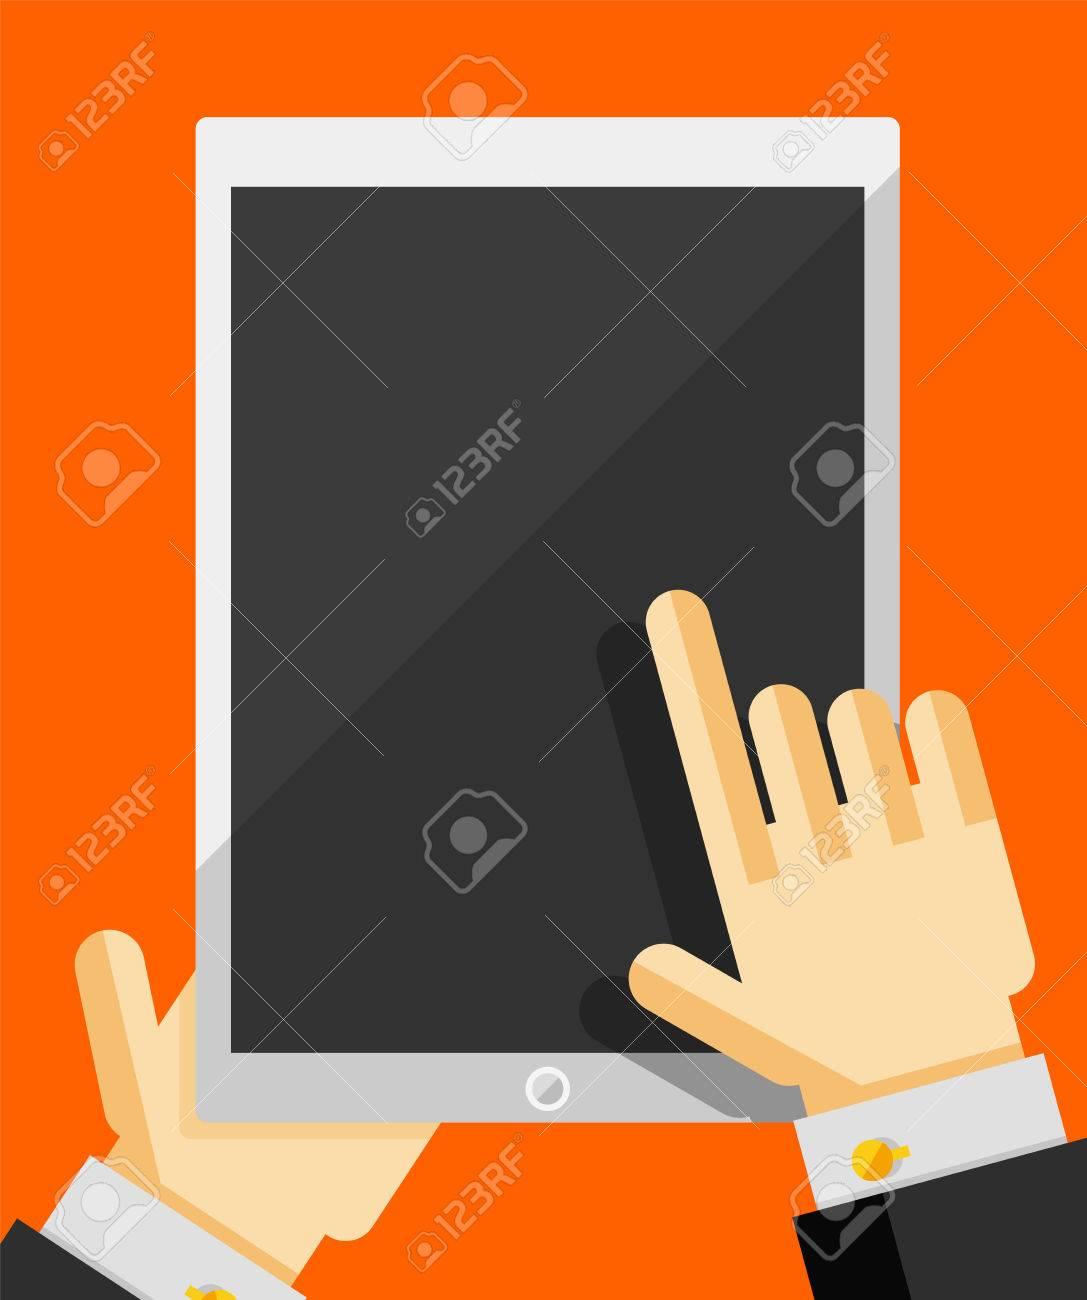 Businessman's hand holding tablet trendy flat design Stock Vector - 27209090